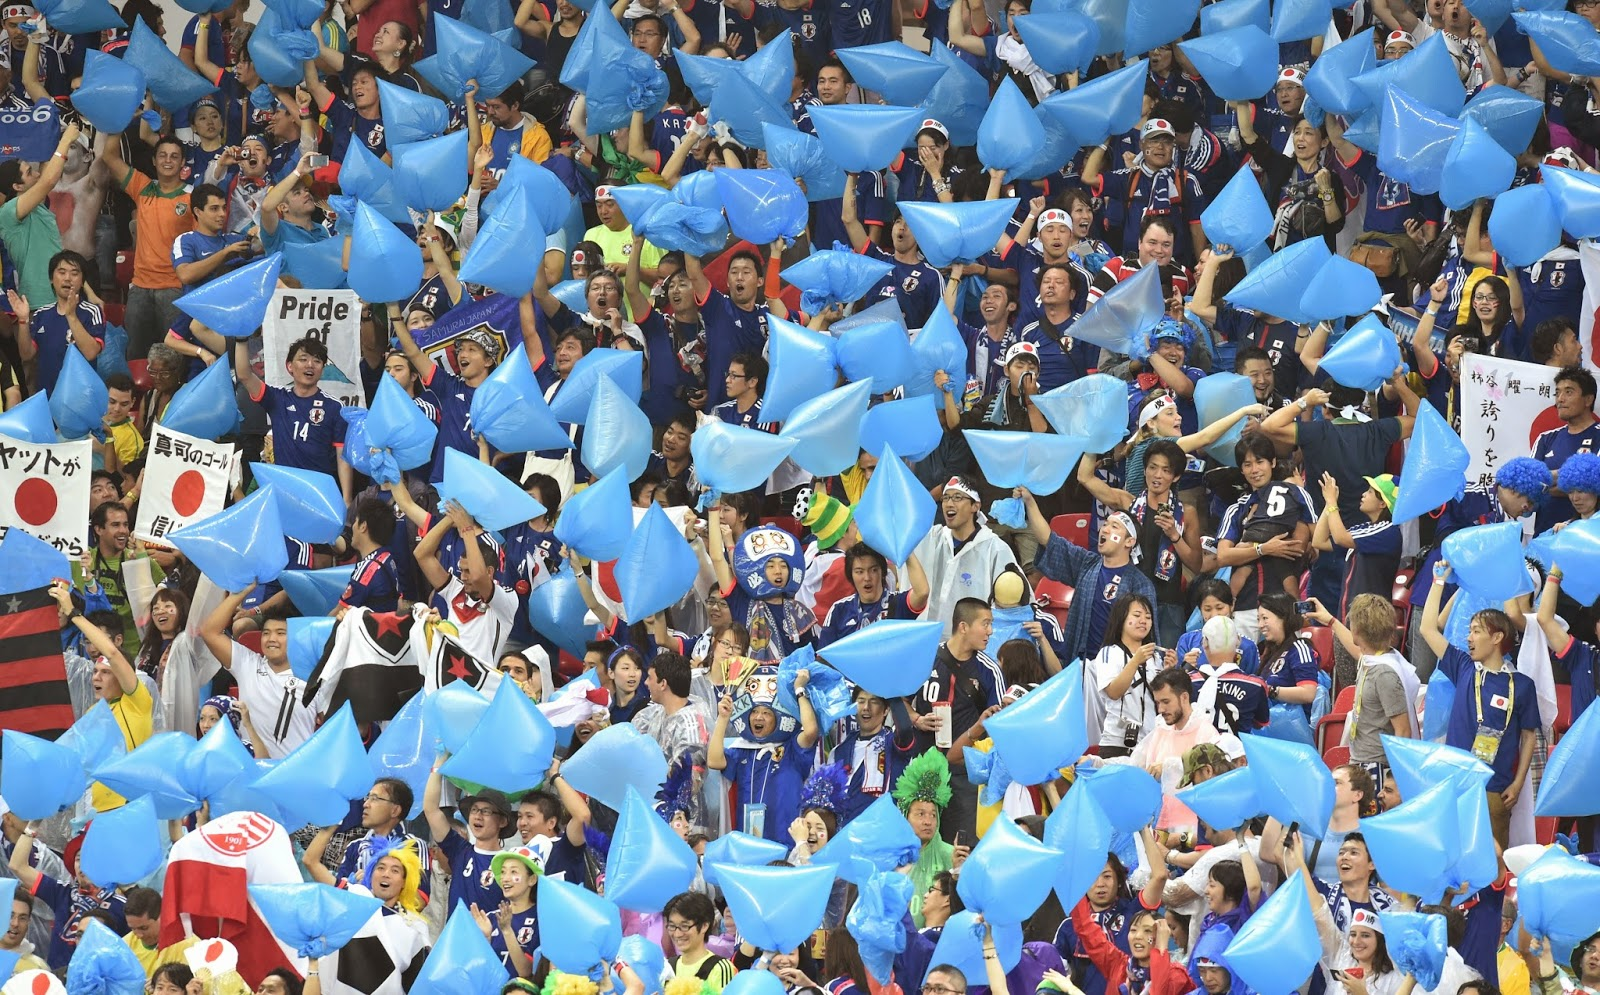 Brazil, Didier Drogba, FIFA World Cup, FIFA World Cup 2014, Football, Gervinho, Group C, Ivory Coast Squad, Japan Squad, Japan vs Ivory Coast, Keisuke Honda, Sabri Lamouchi, Sports, Yuto Nagatomo,